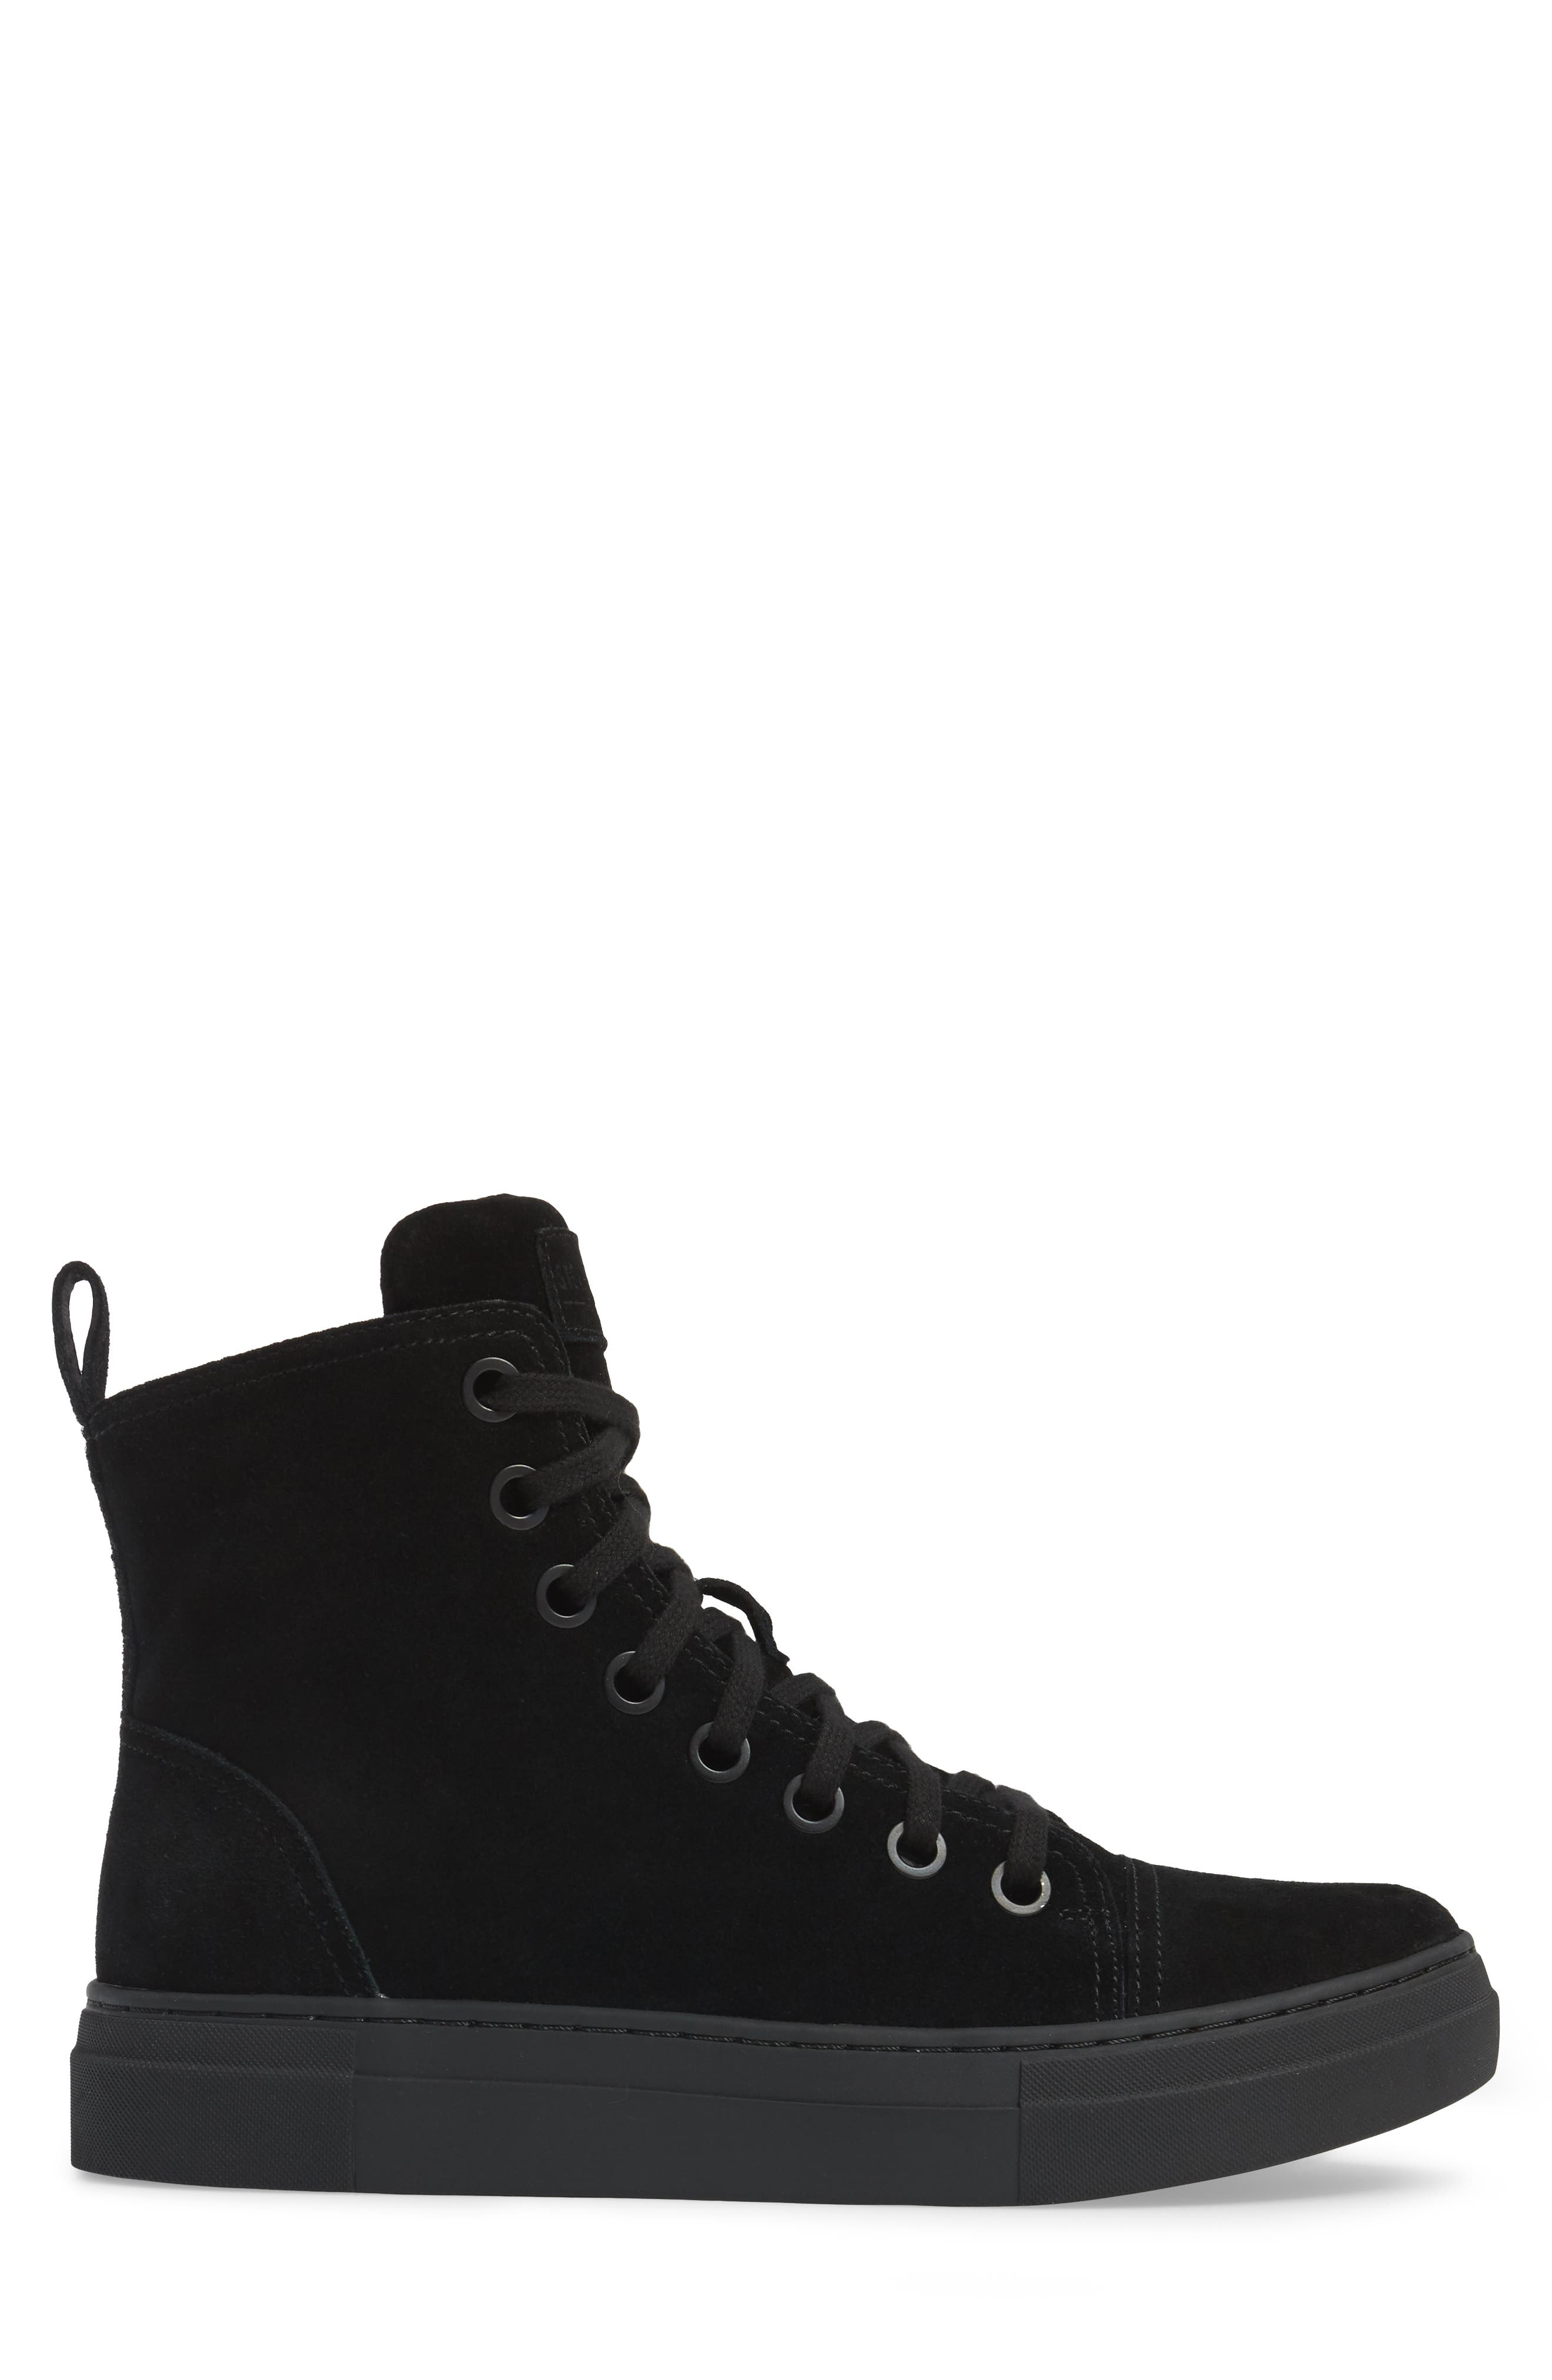 Ormisten Sneaker,                             Alternate thumbnail 3, color,                             Black Suede